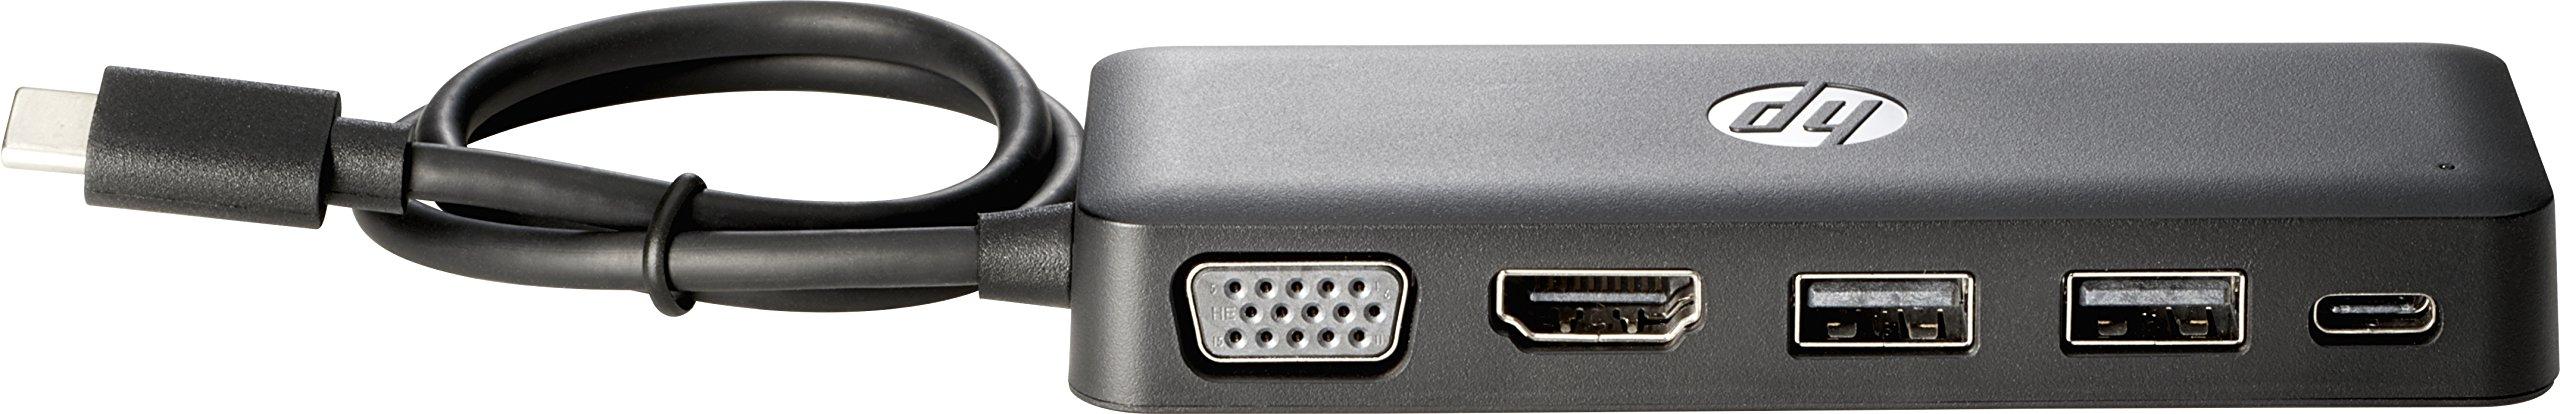 HP Z9G82AA Travel Hub - Port replicator - (USB-C) - for Chromebook 13 G1, EliteBook x360, Pro x2, Spectre Pro 13 G1, ZBook 15 G4, 17 G4, Studio G4 by HP